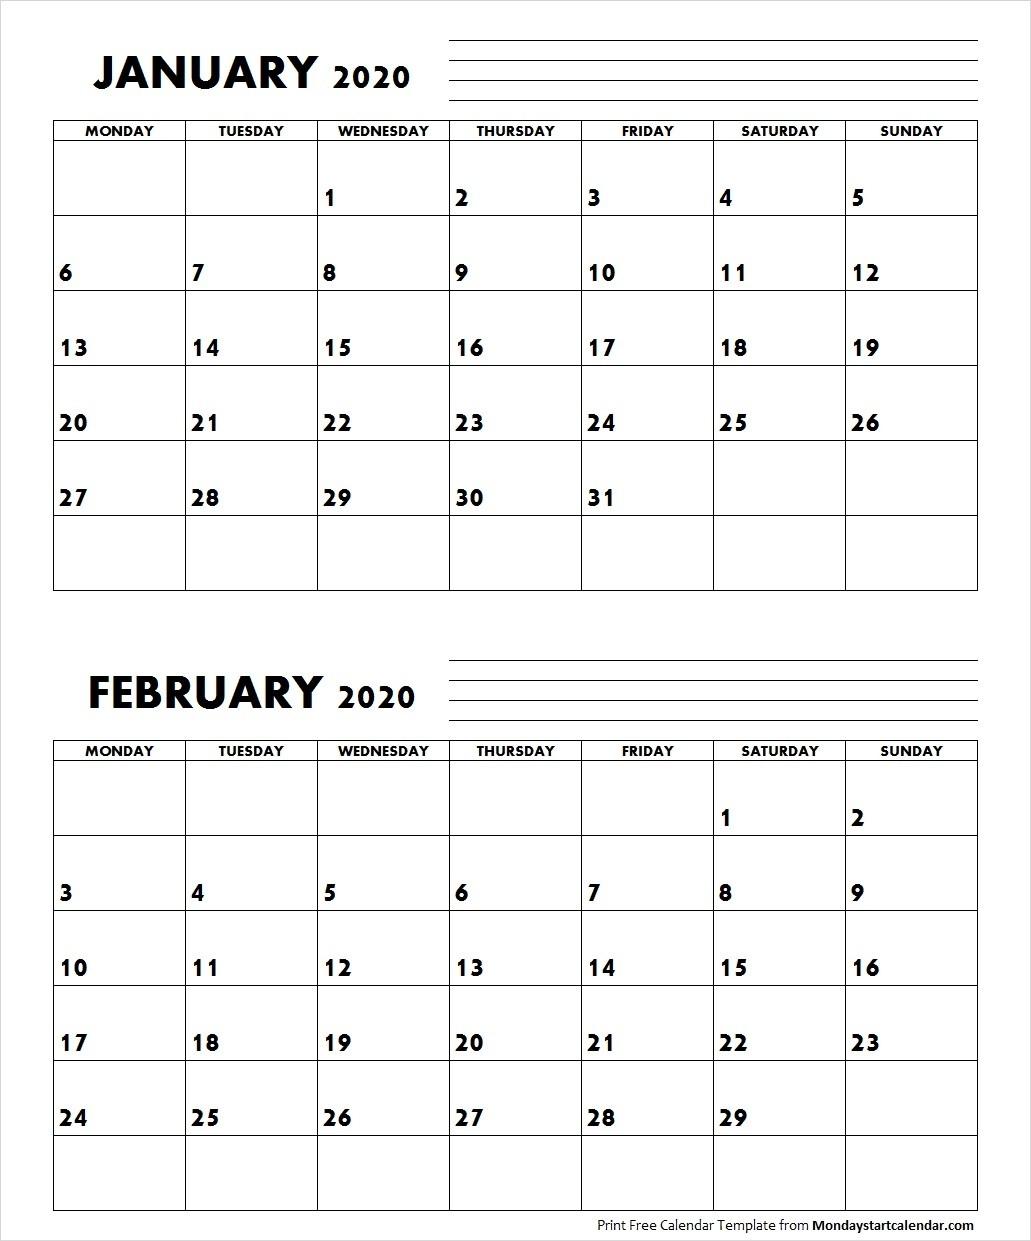 Jan Feb 2020 Calendar Monday Start | Editable Two Months-January Feb 2020 Calendar